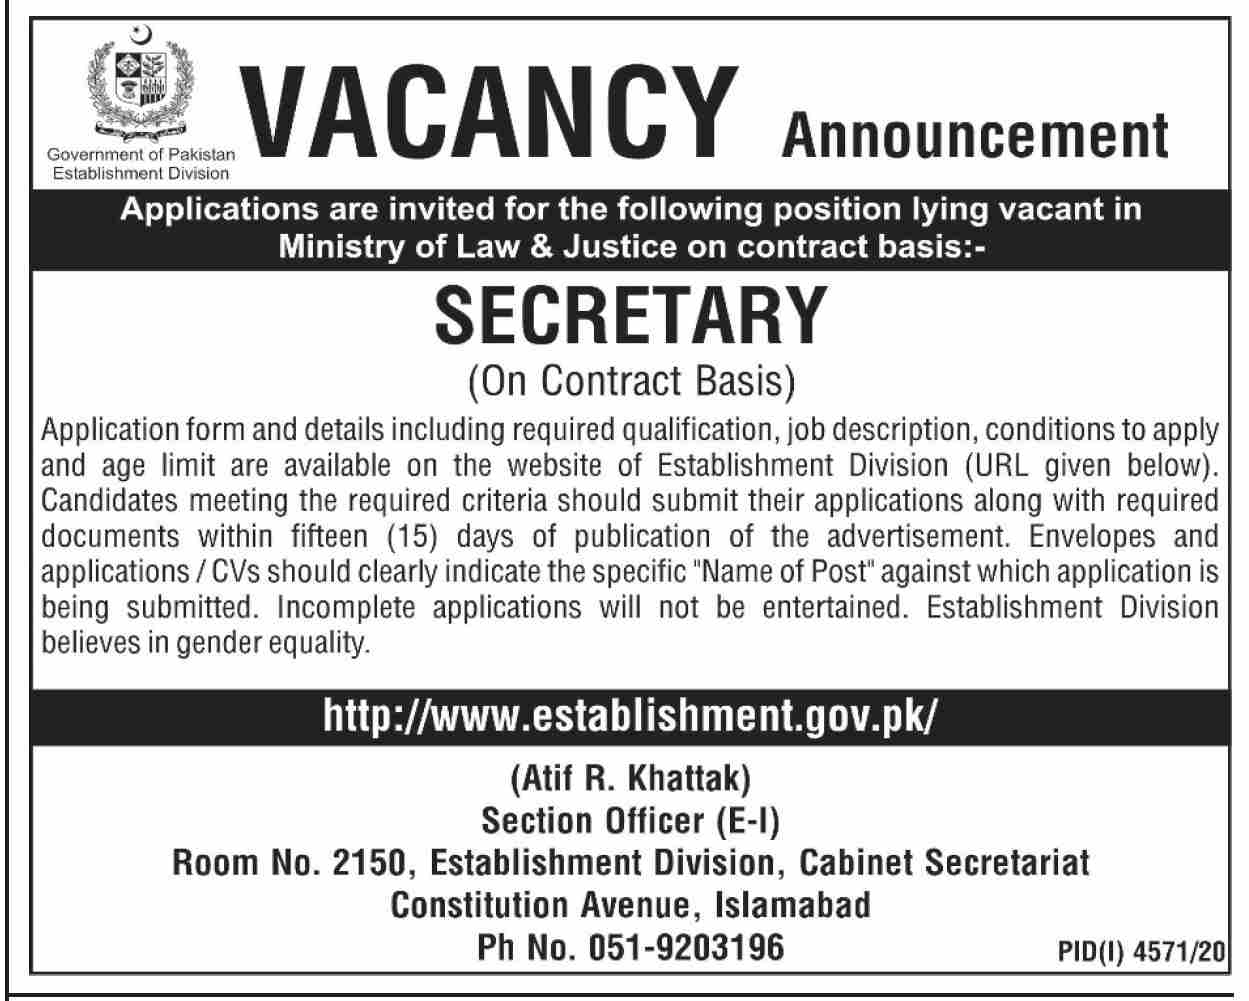 2021 Dawn Newspaper Jobs, Dawn Jobs, Latest Dawn Jobs, Daily Newspaper Jobs,nokristan,newjobs2021,latest govt jobs